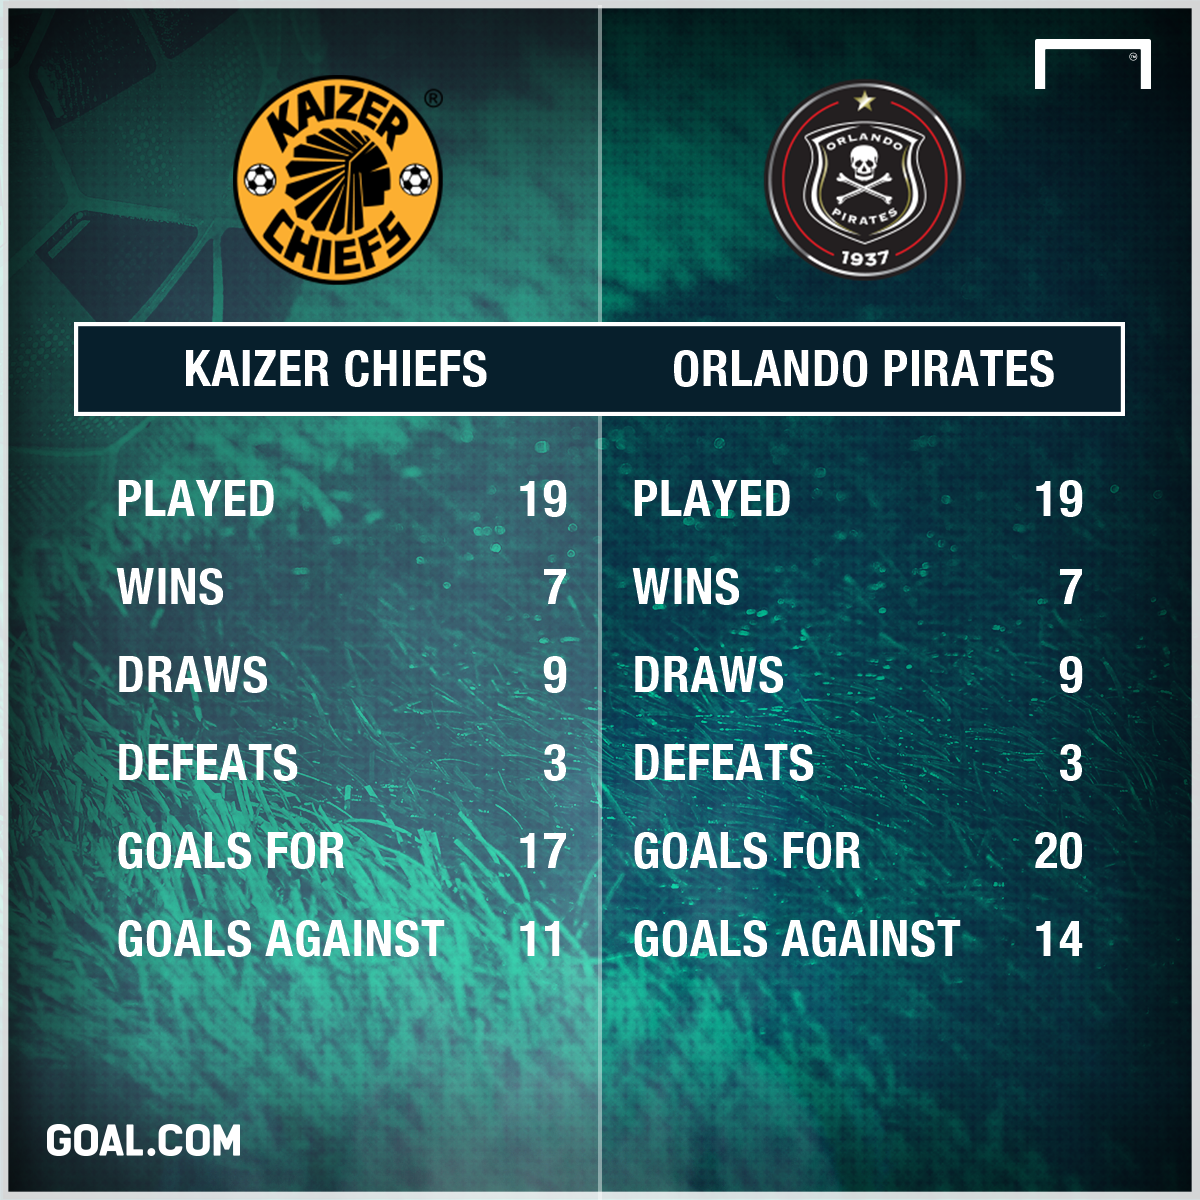 Chiefs & Pirates records